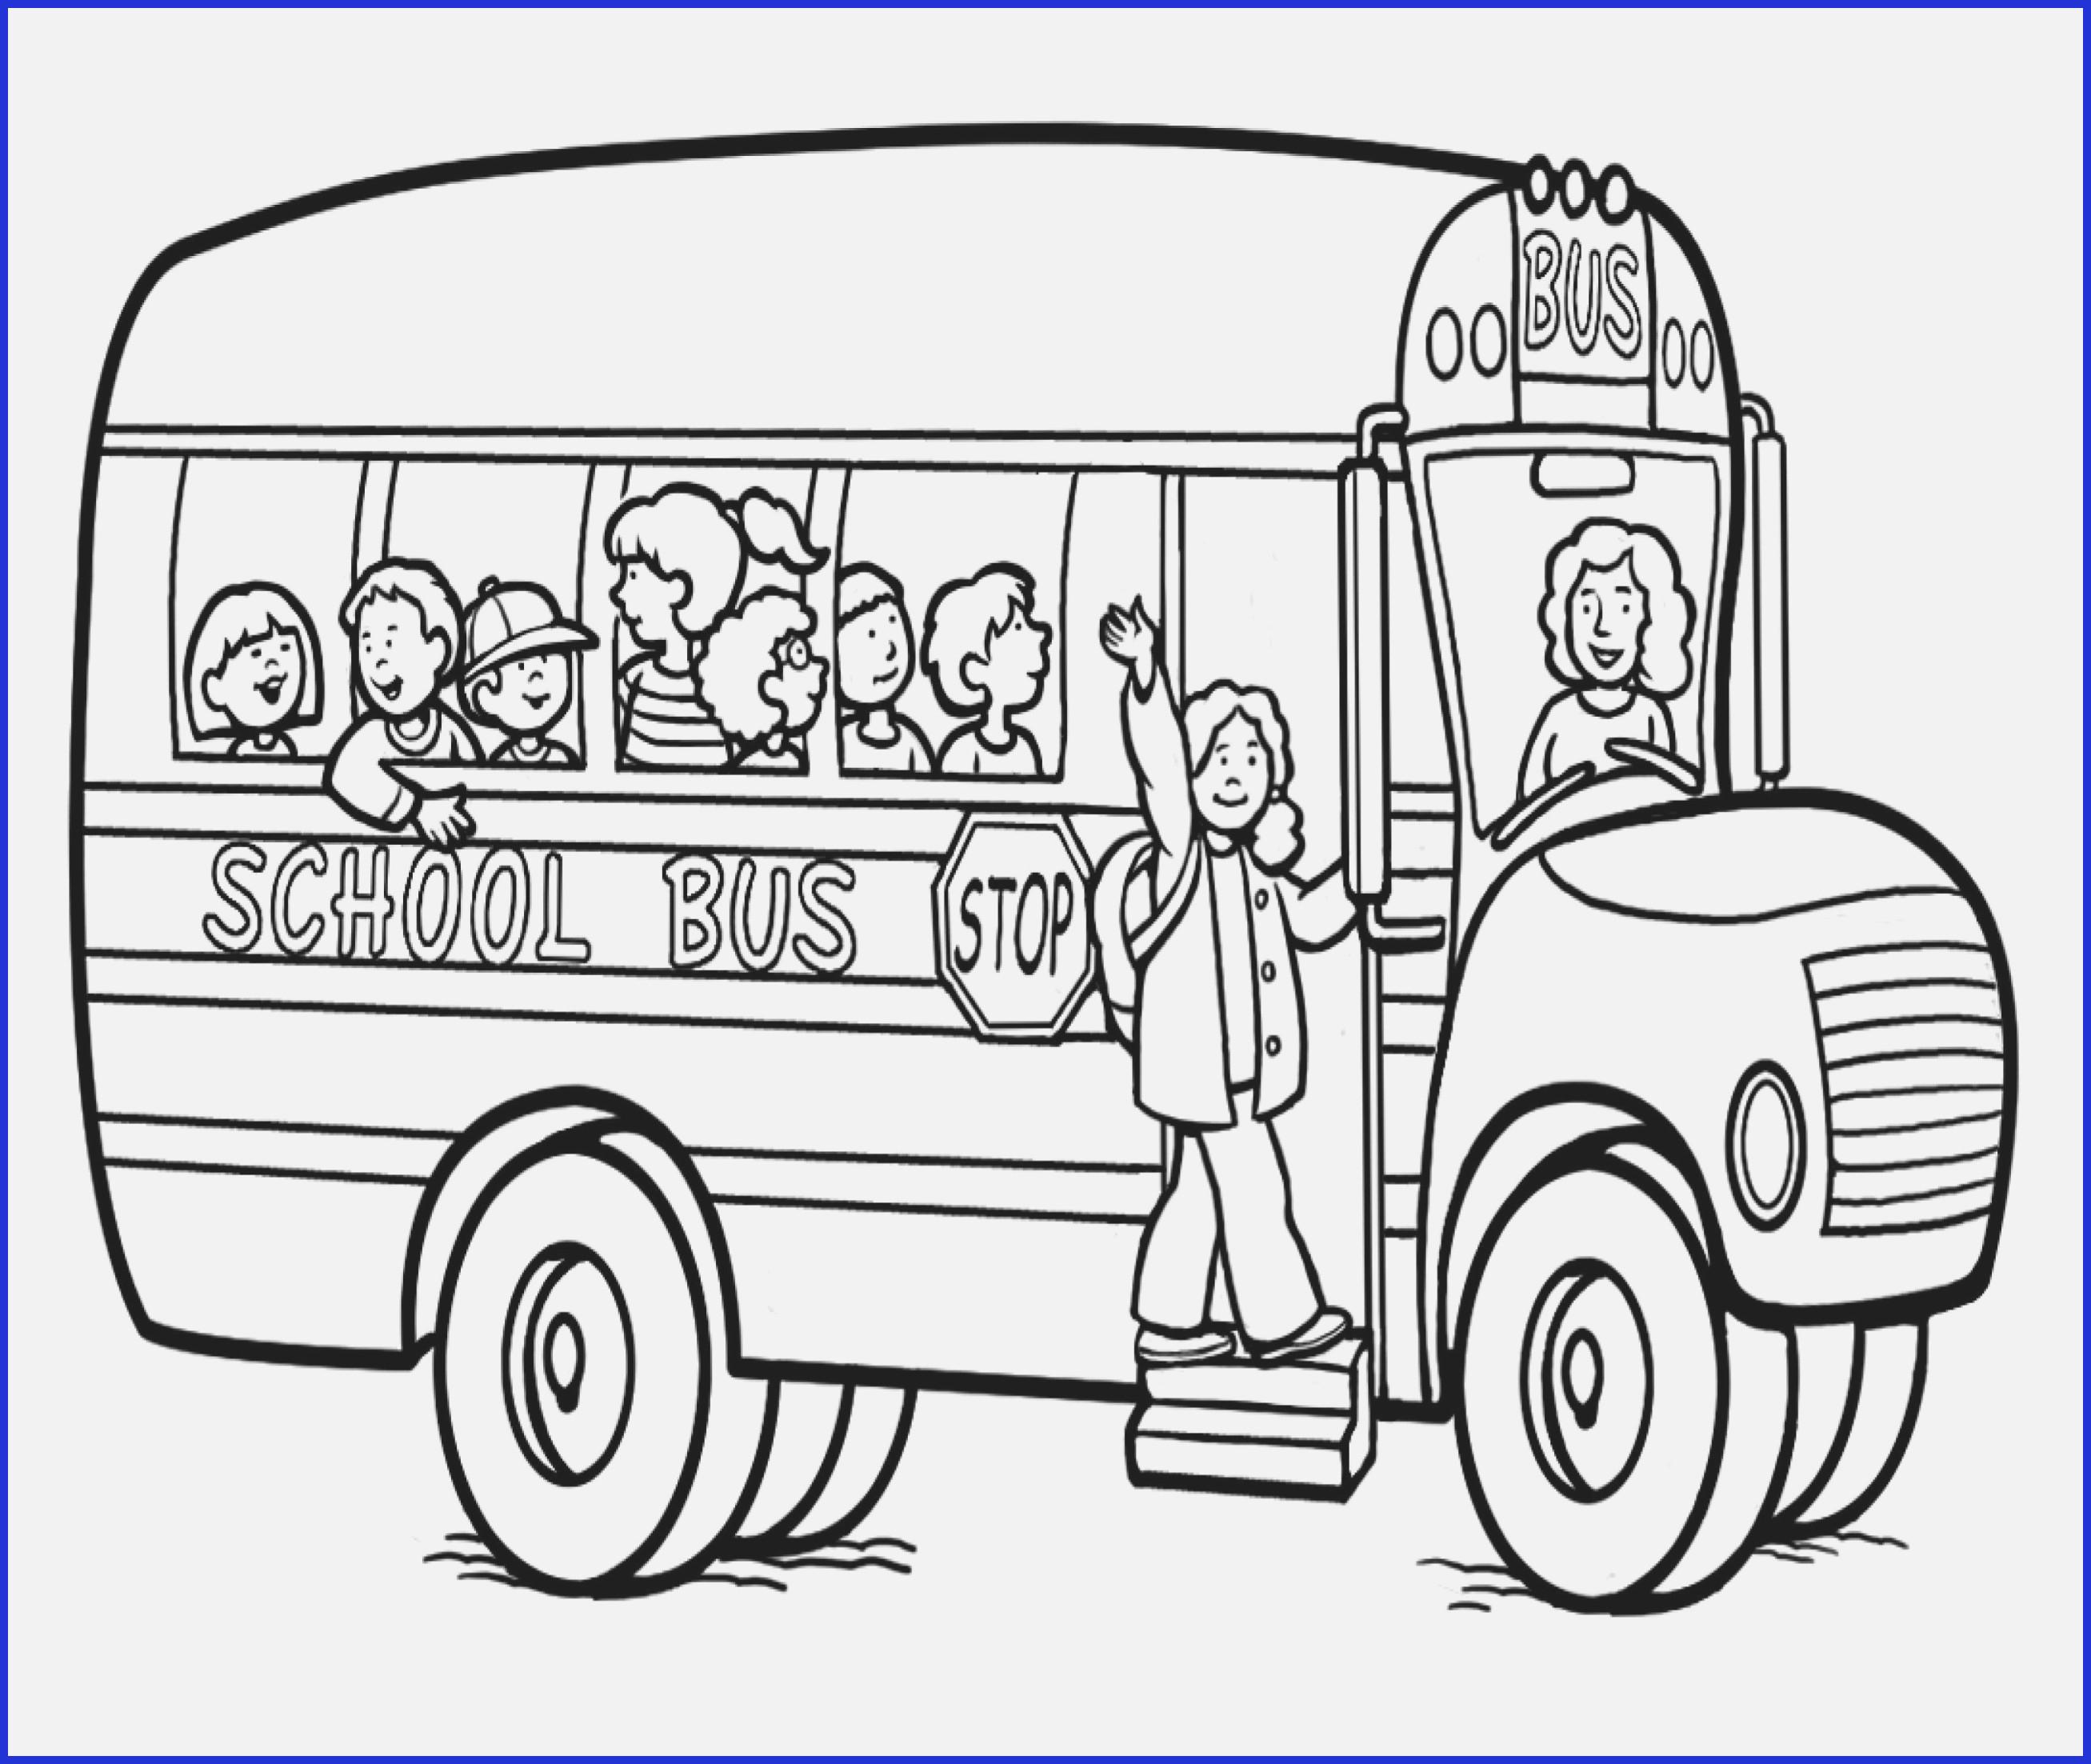 School Bus Coloring Page School Bus Coloring Page Elegant School Bus Coloring Page Coloring